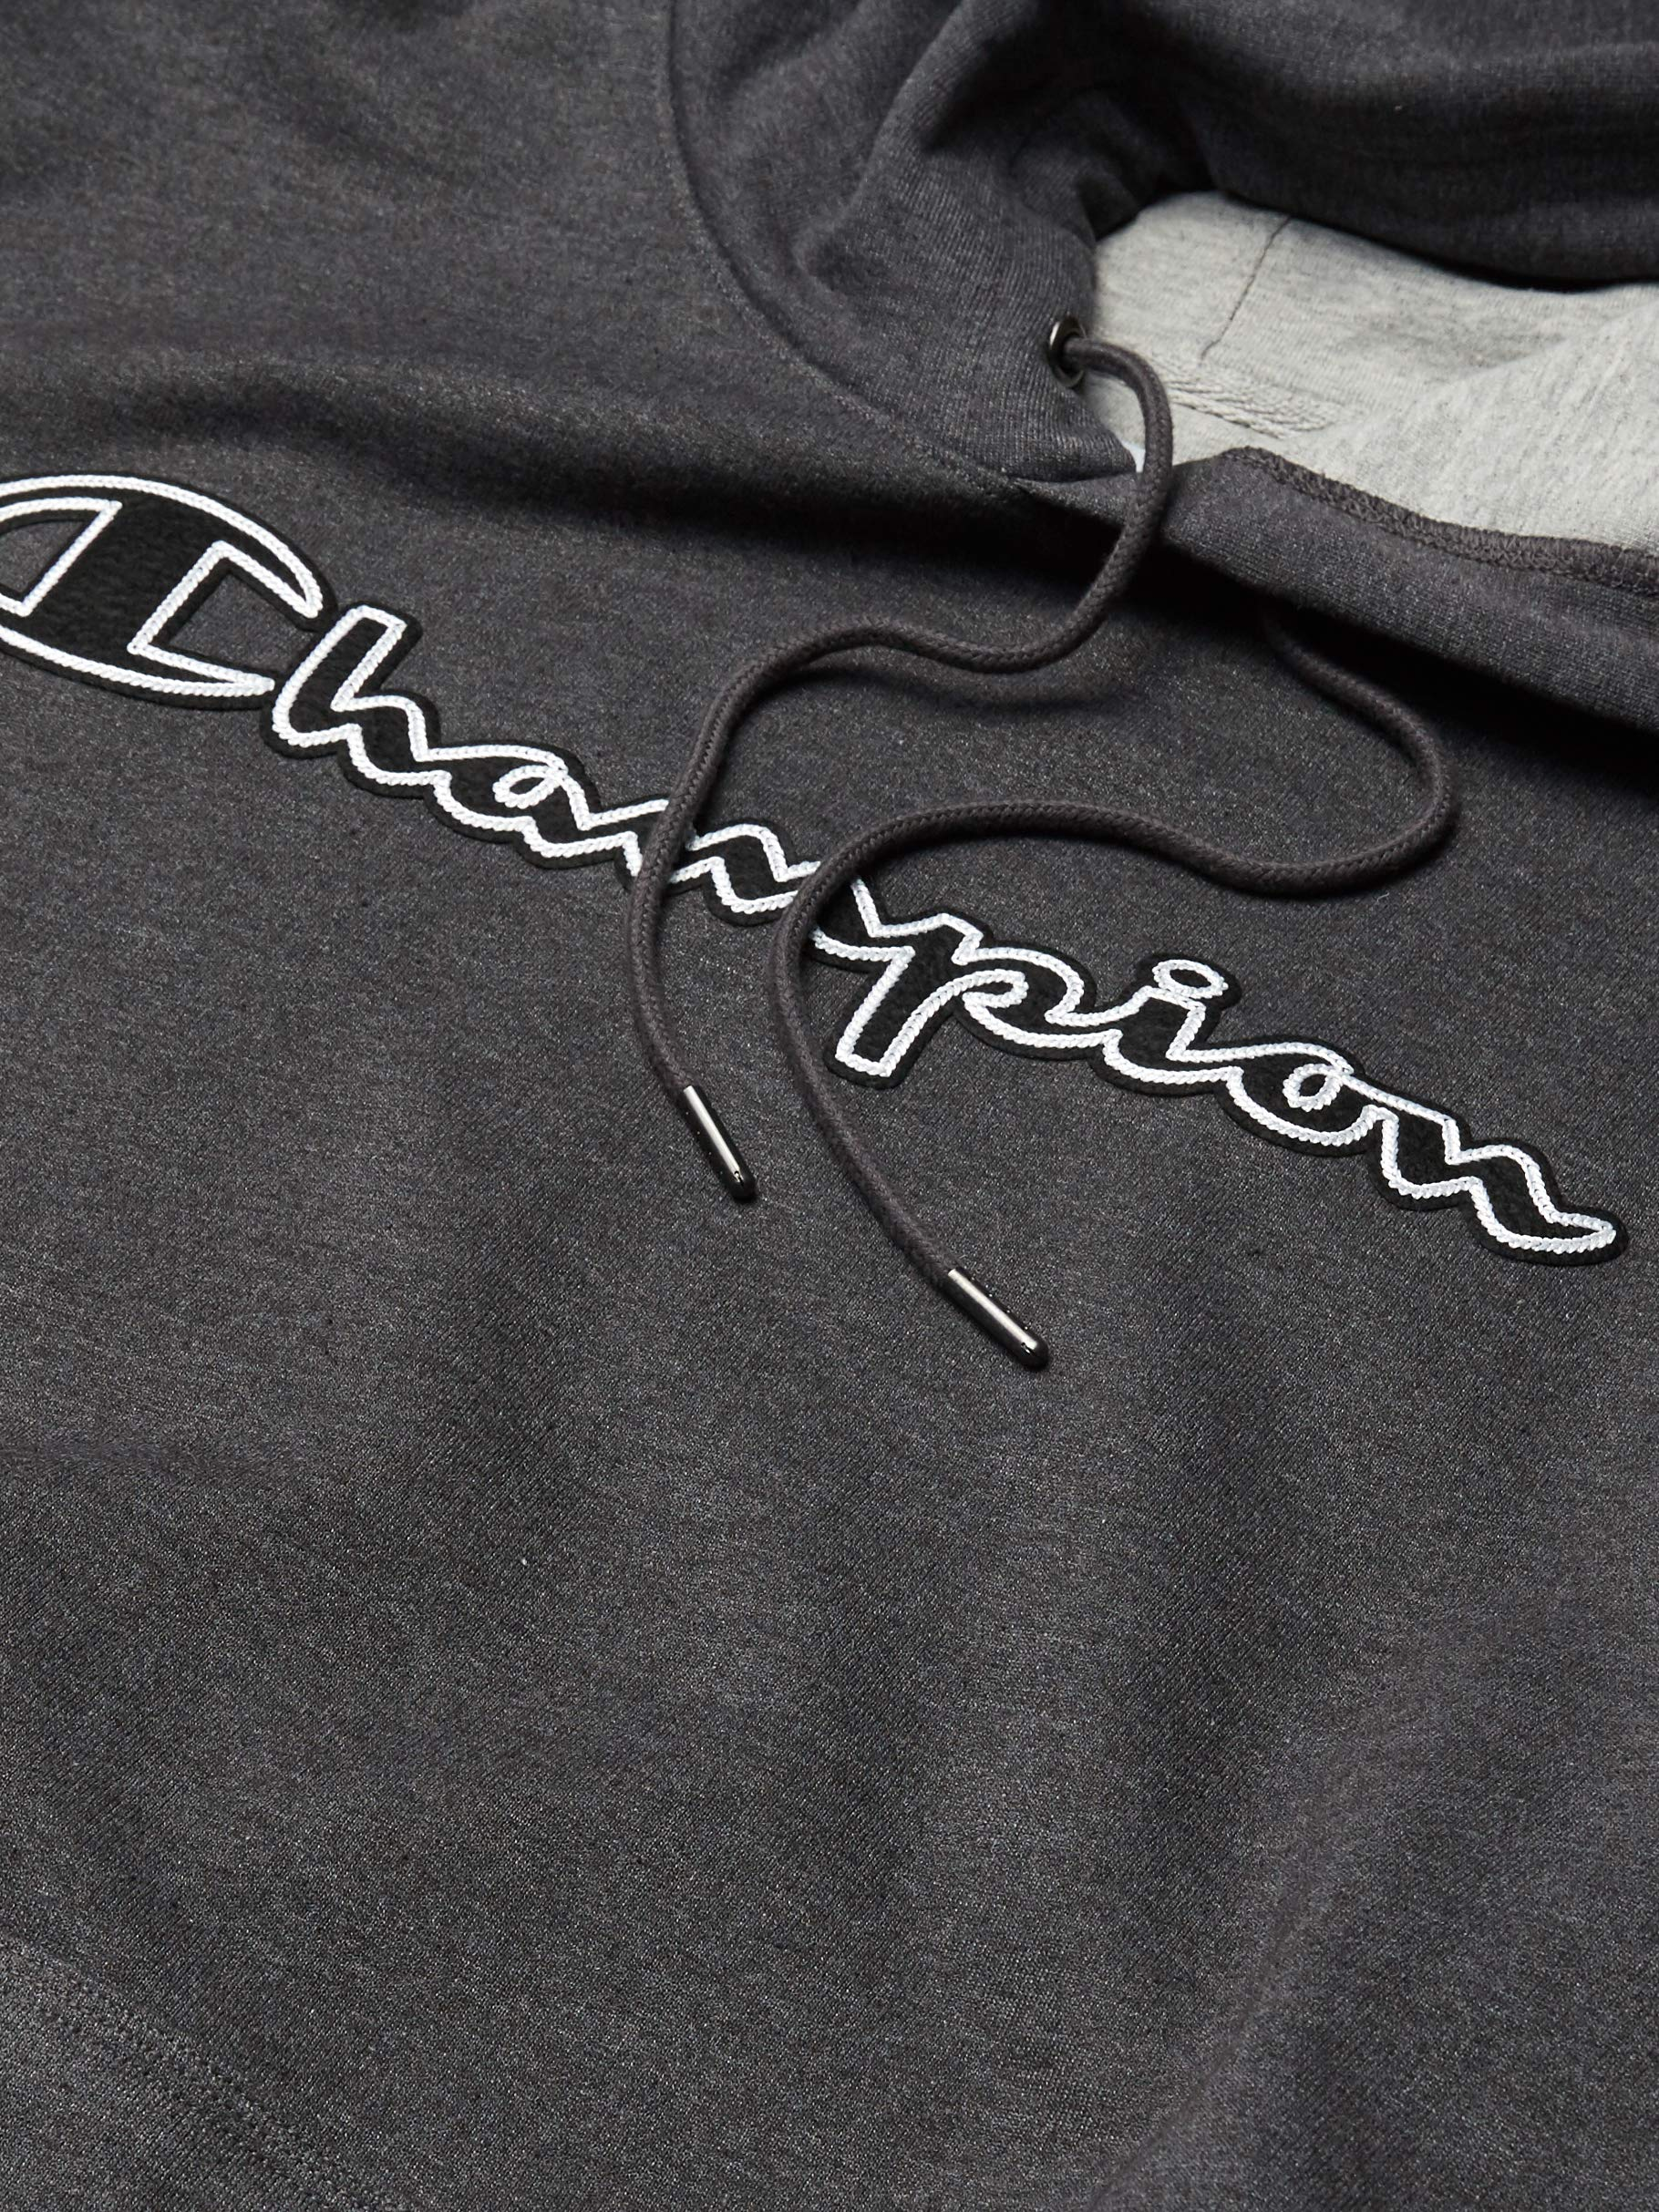 Fashion Shopping Champion Men's Powerblend Applique Hoodie